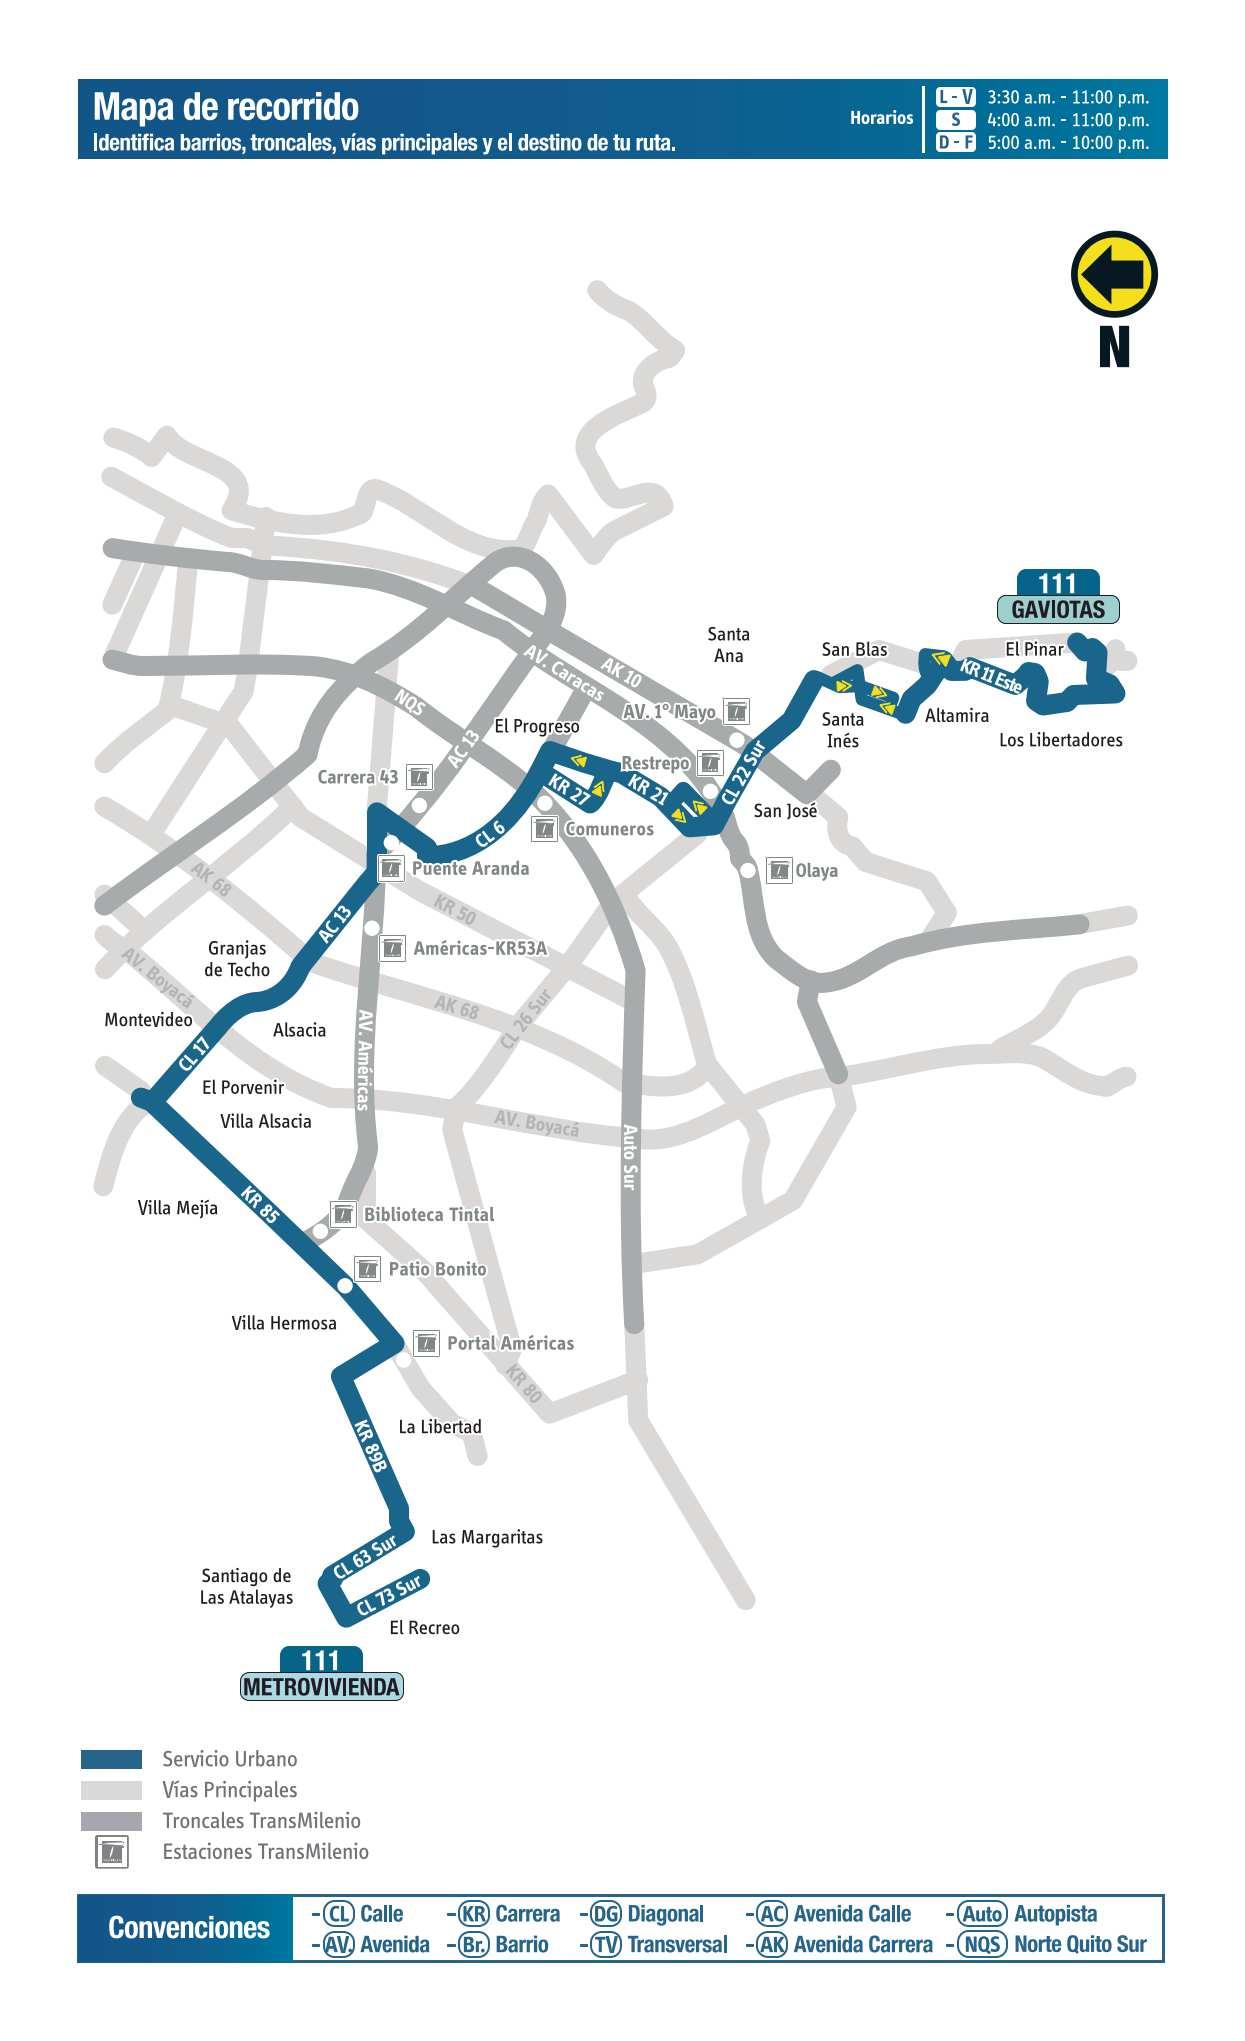 111 Gaviotas - Metrovivienda, ruta bus urbano Bogotá